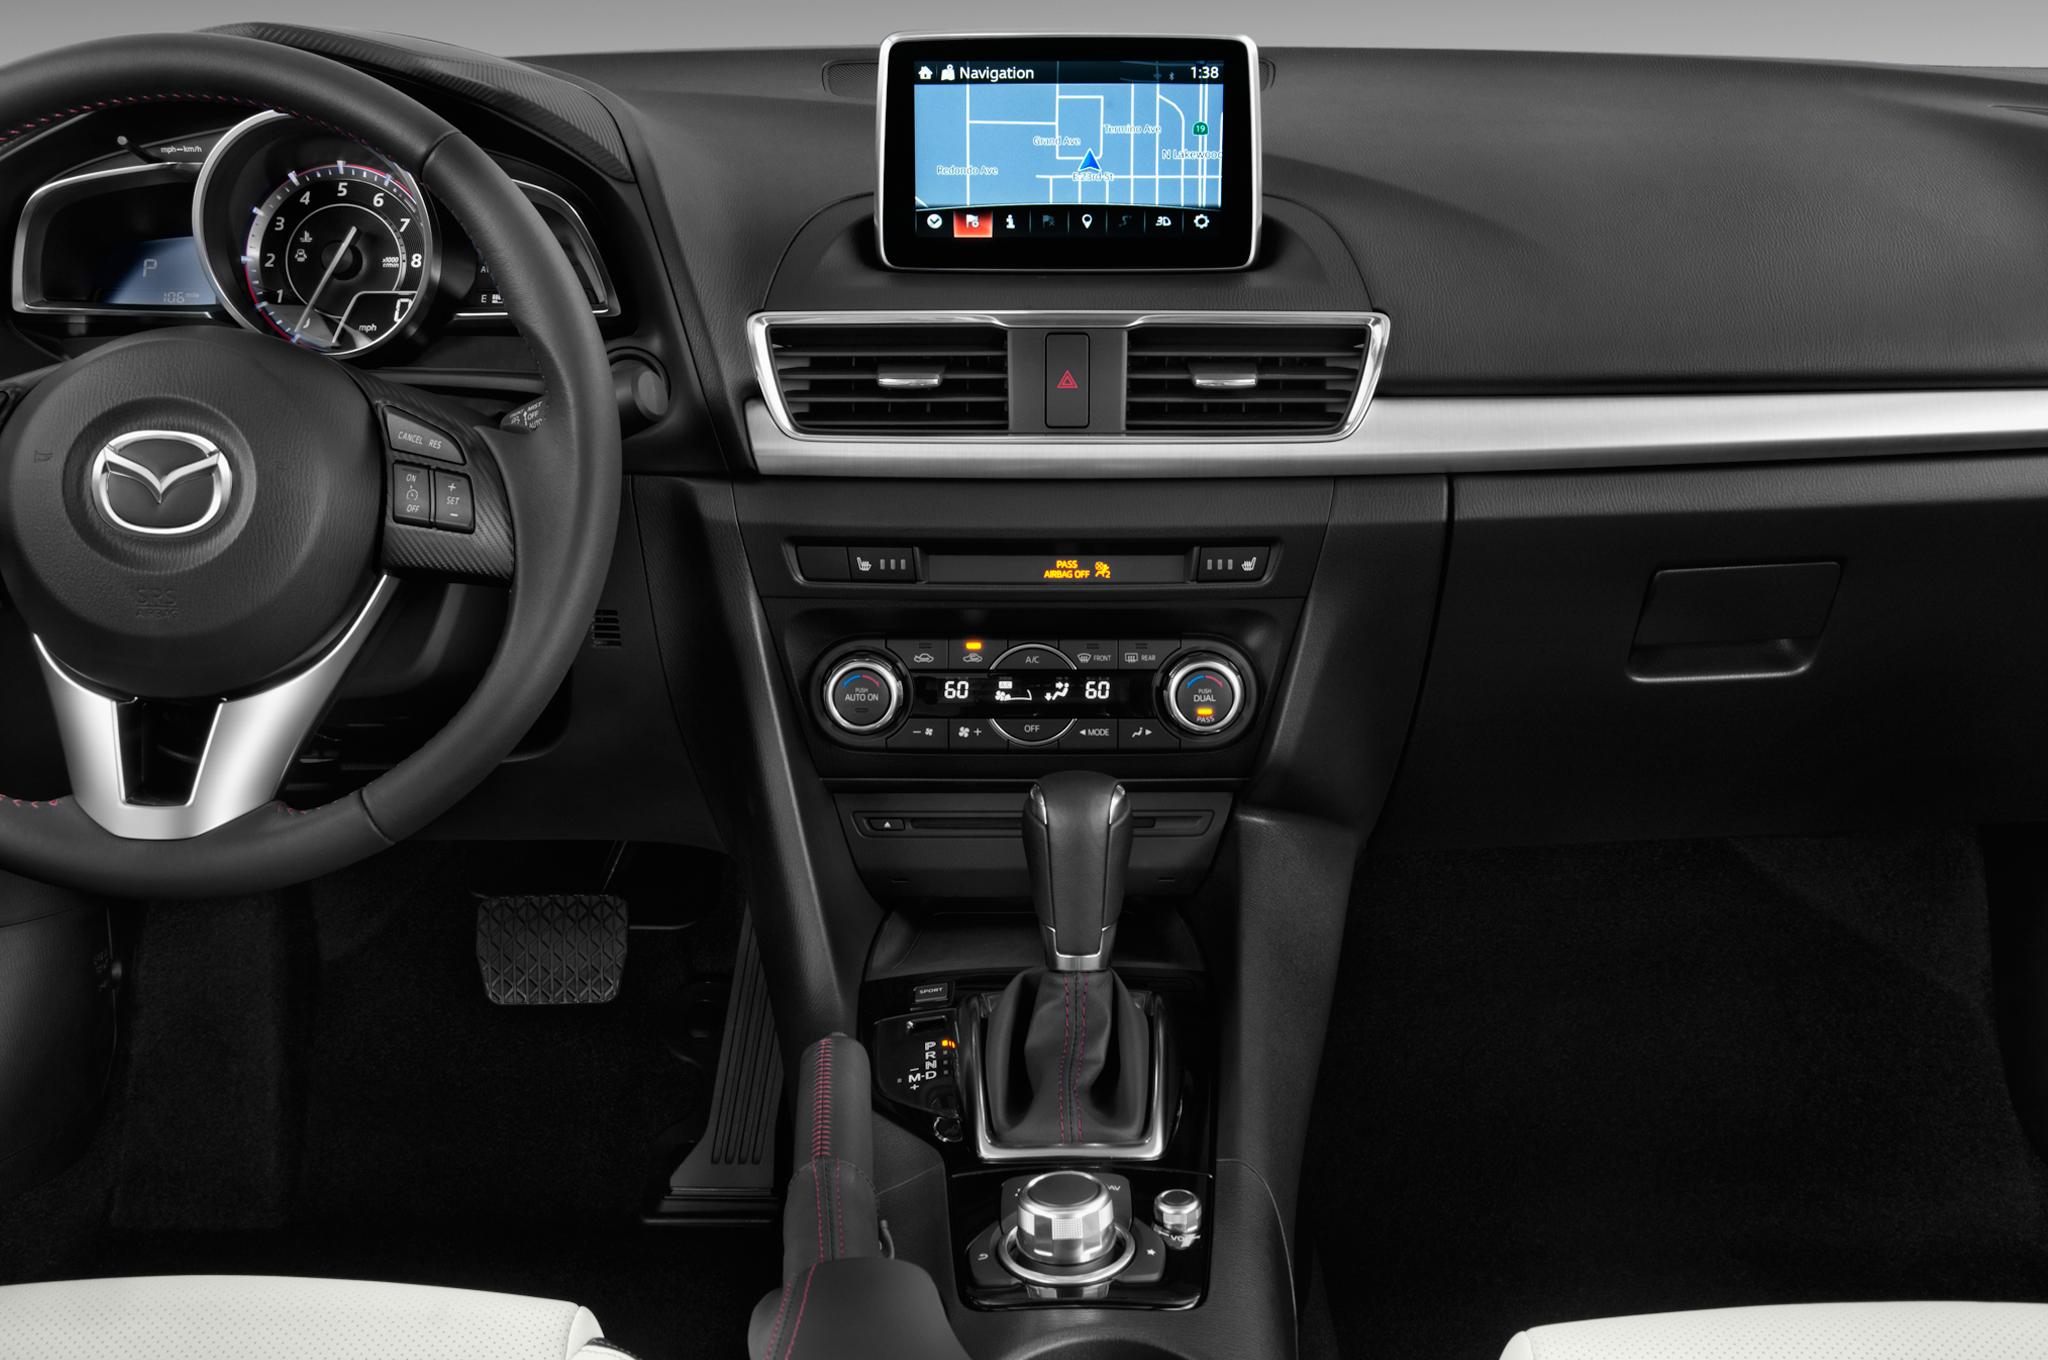 2015 mazda 3 updated gains manual transmission for 2 5l engine rh automobilemag com Mazda 3 Manual Transmission Mazda 3 Colour 2007